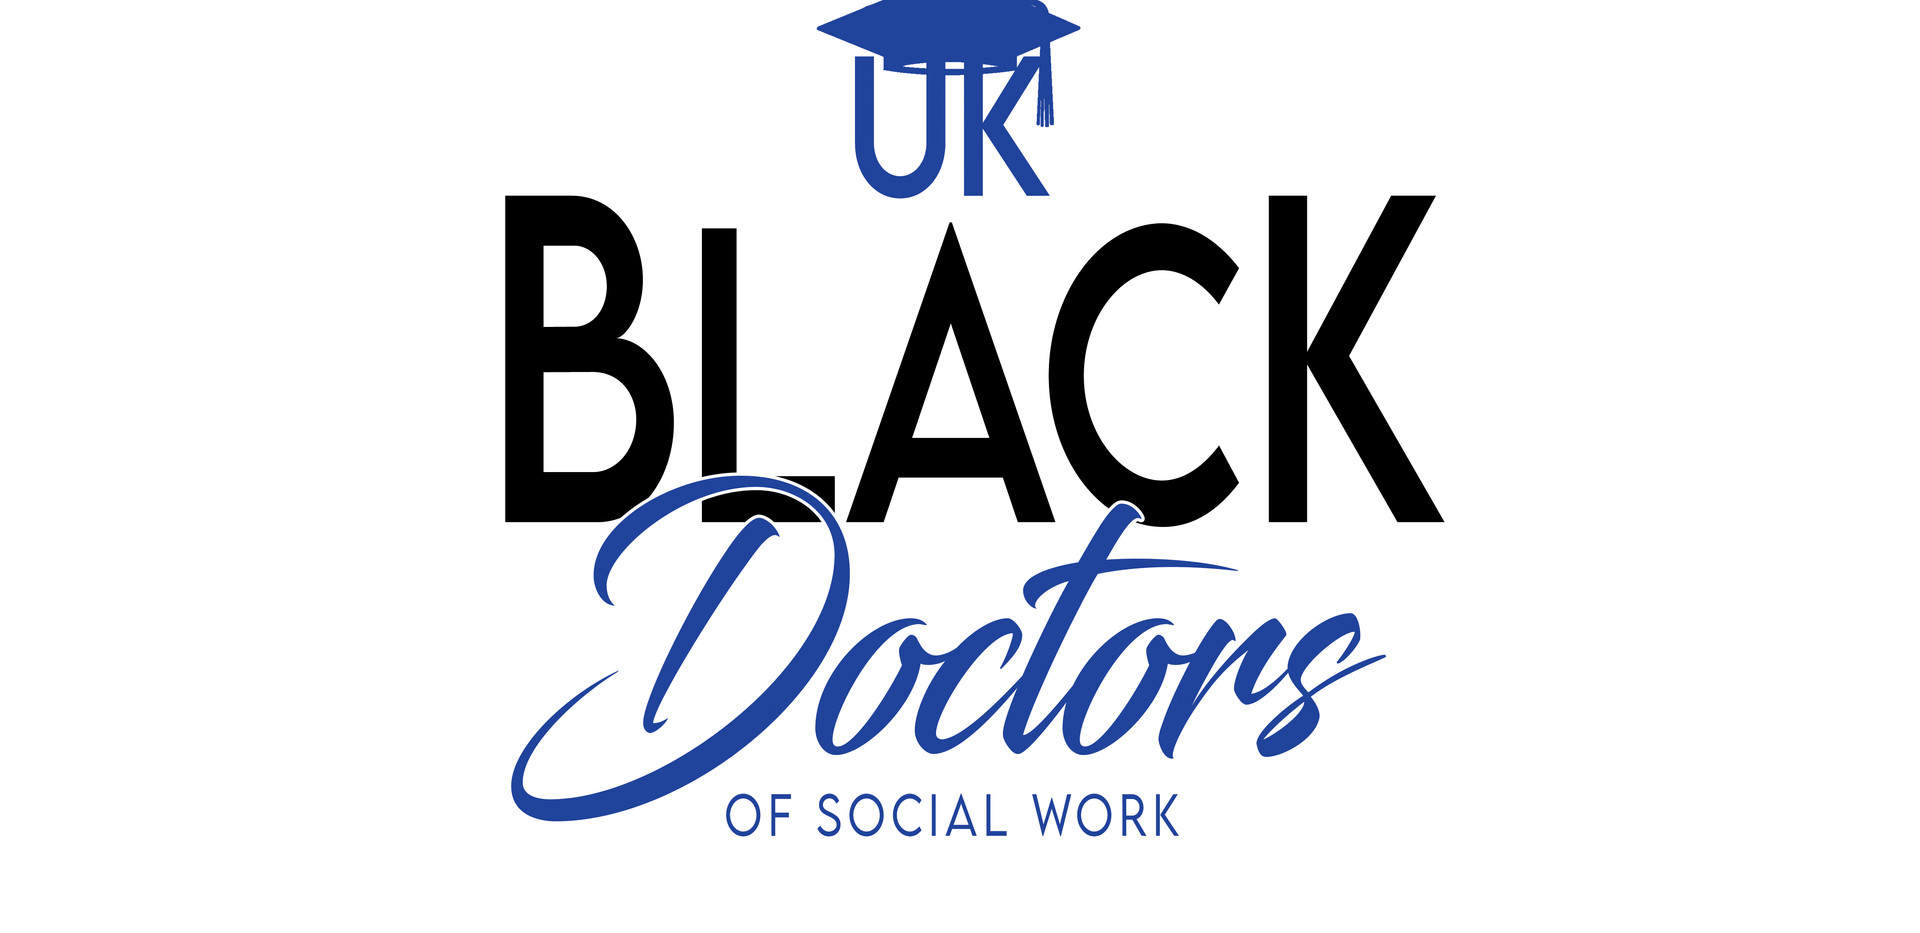 UK Doctoral Program of Social Work